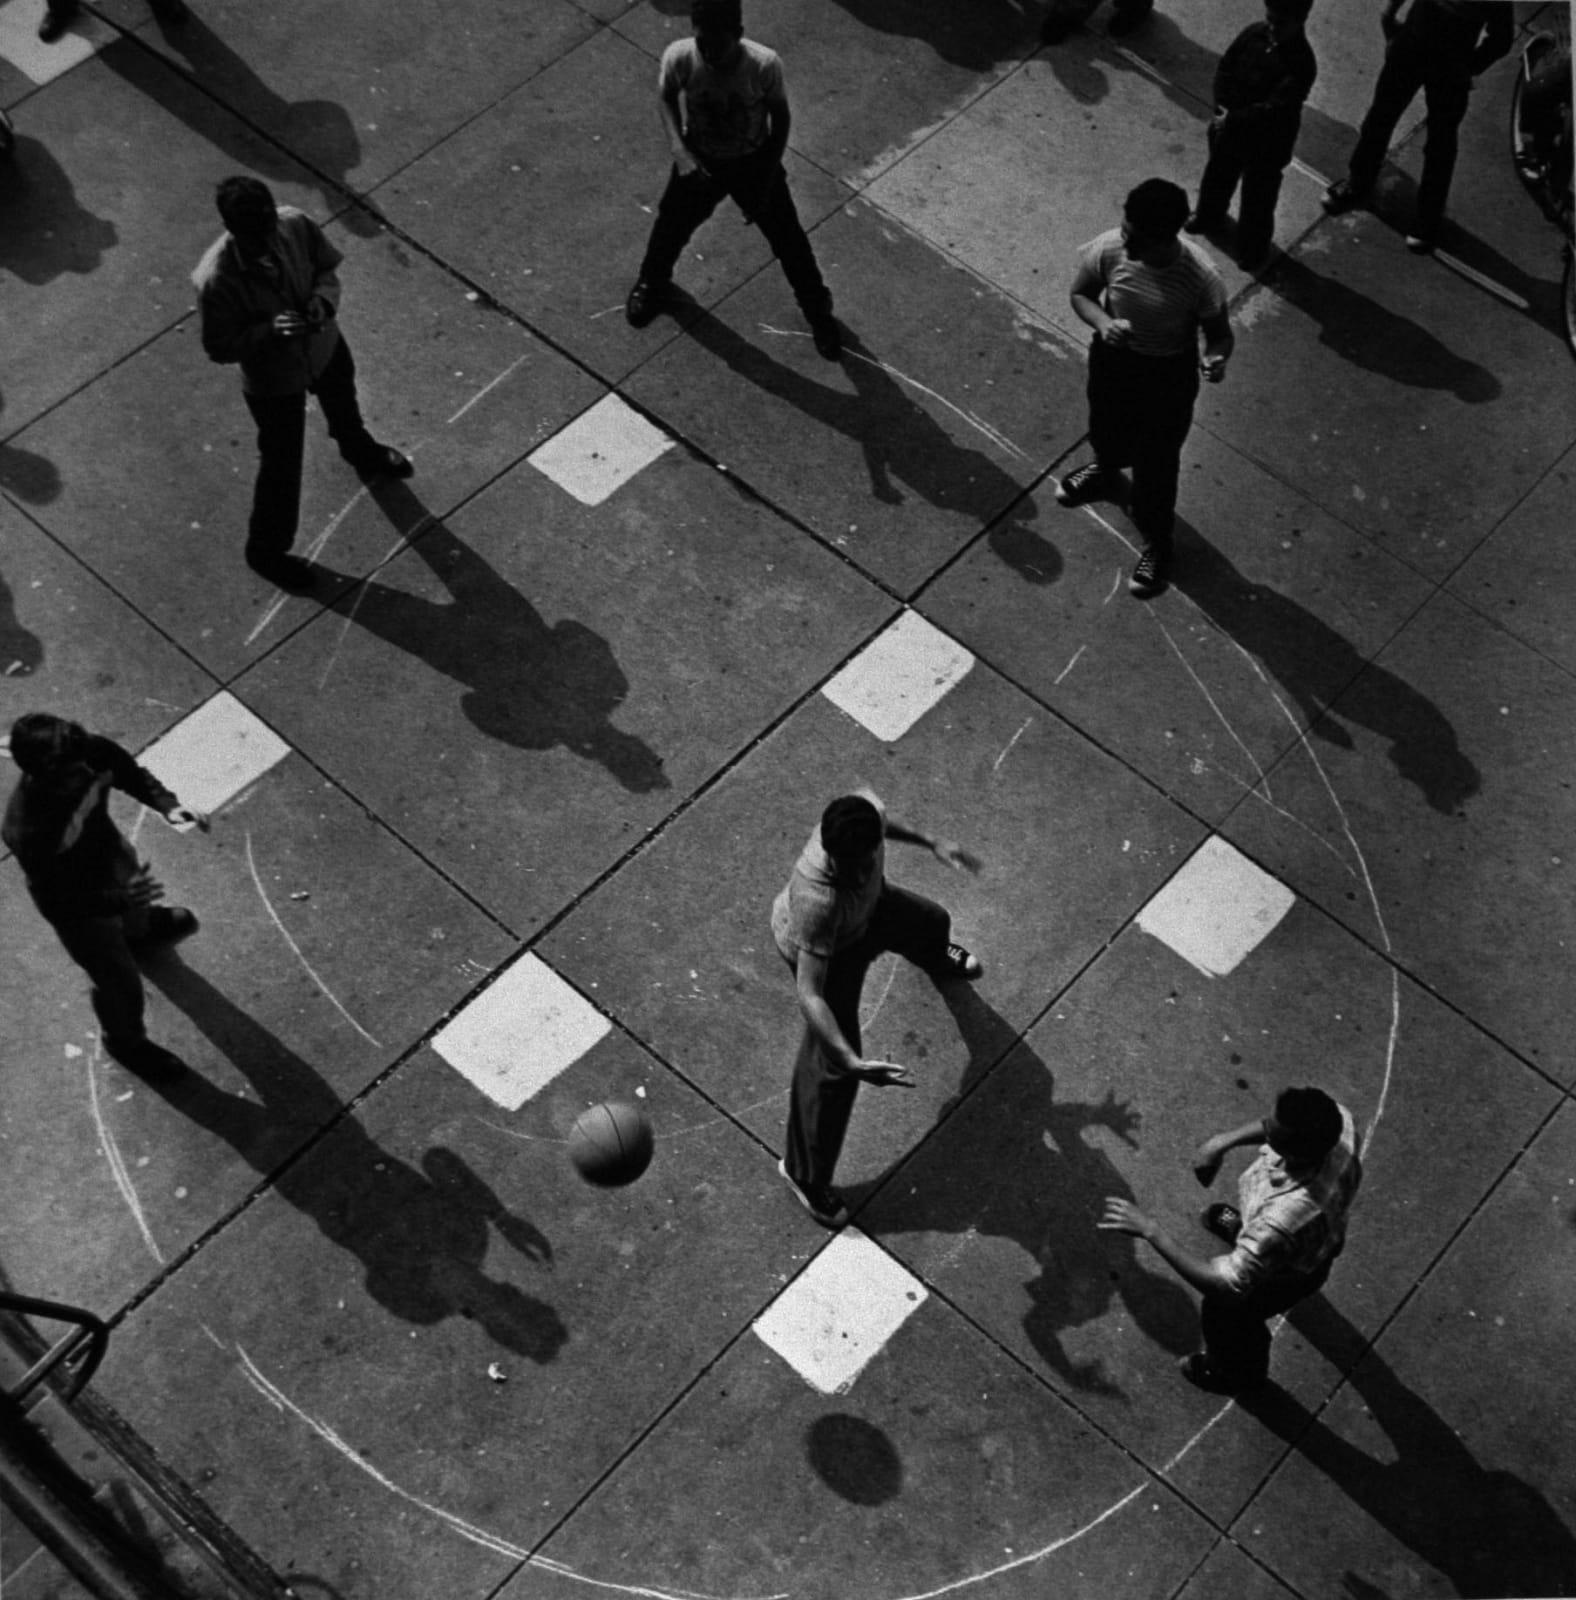 SOLD: Arthur Leipzig - Dodge Ball, NYC, 1950